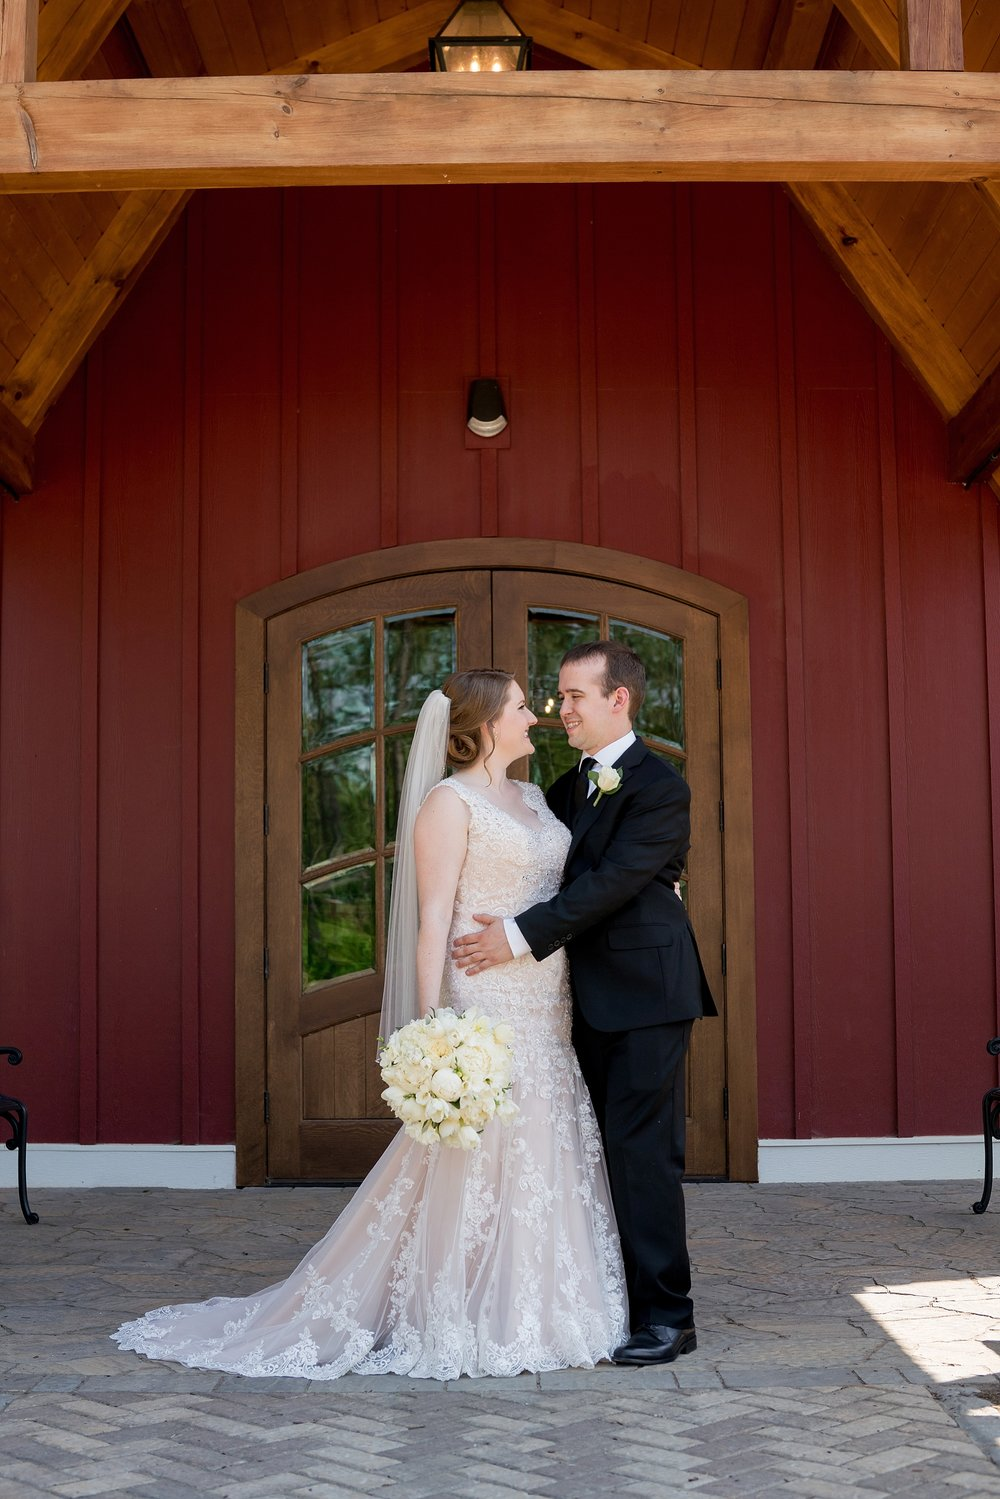 Pavilion-Carriage-Farms-Wedding-Photographer-207.jpg